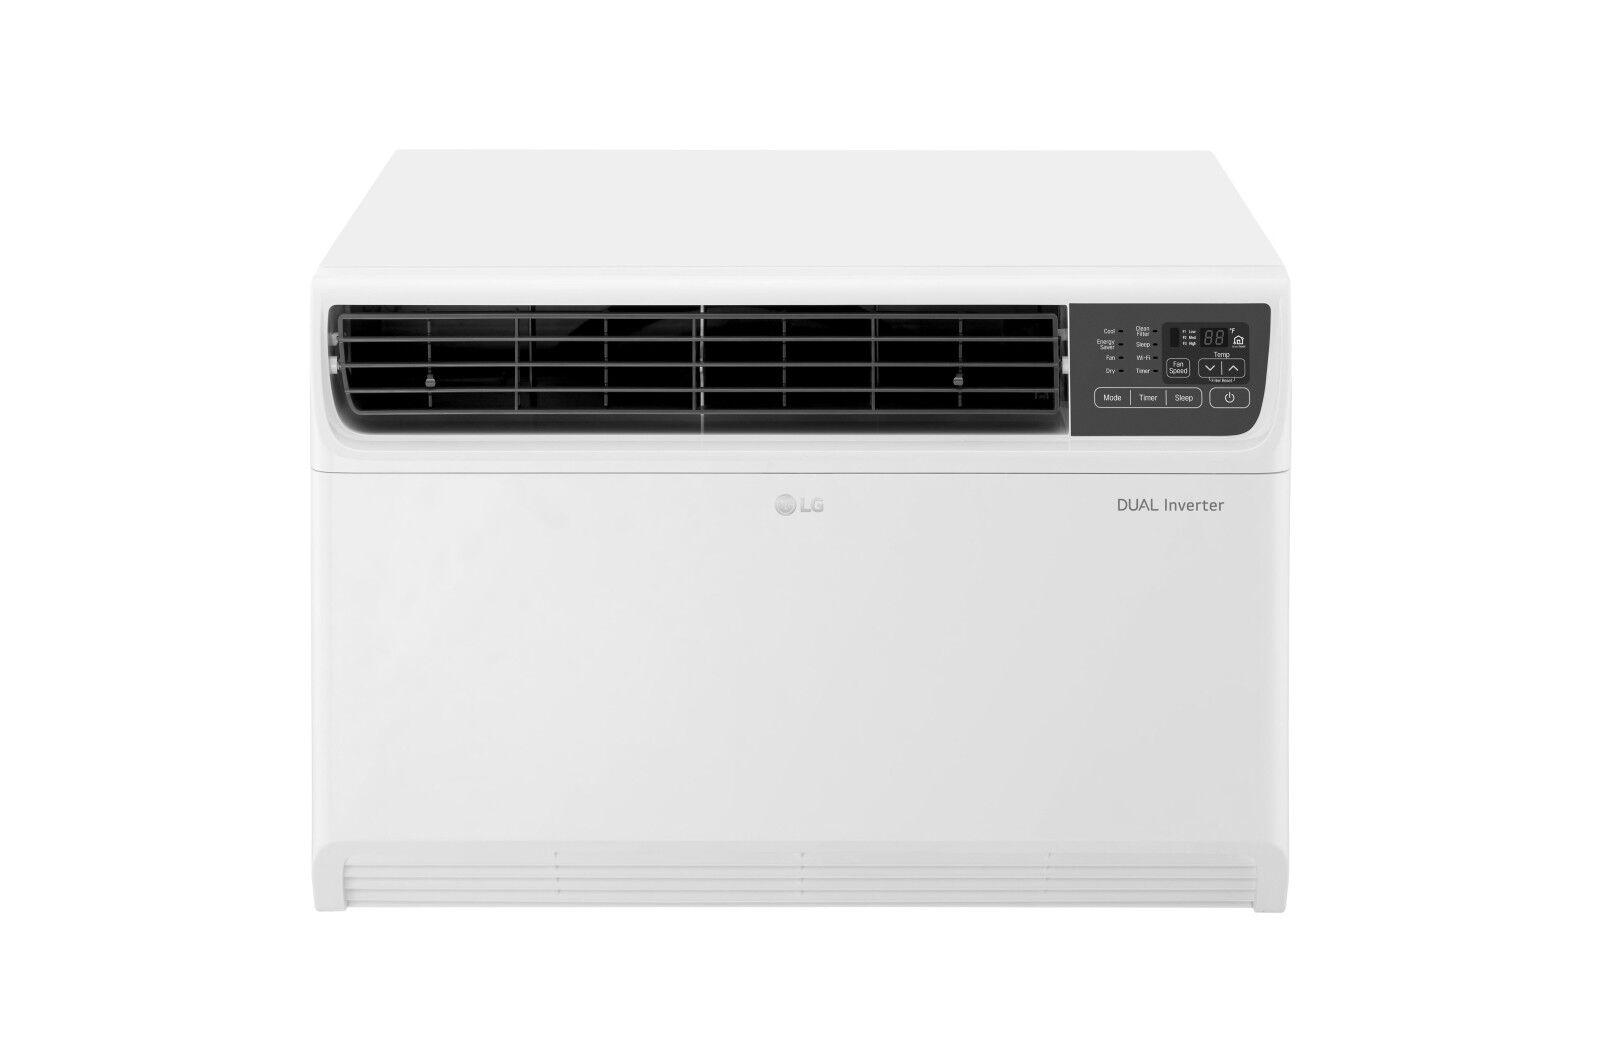 lg-lw1817ivsm-18000-btu-dual-inverter-smart-wi-fi-enabled-window-a-c